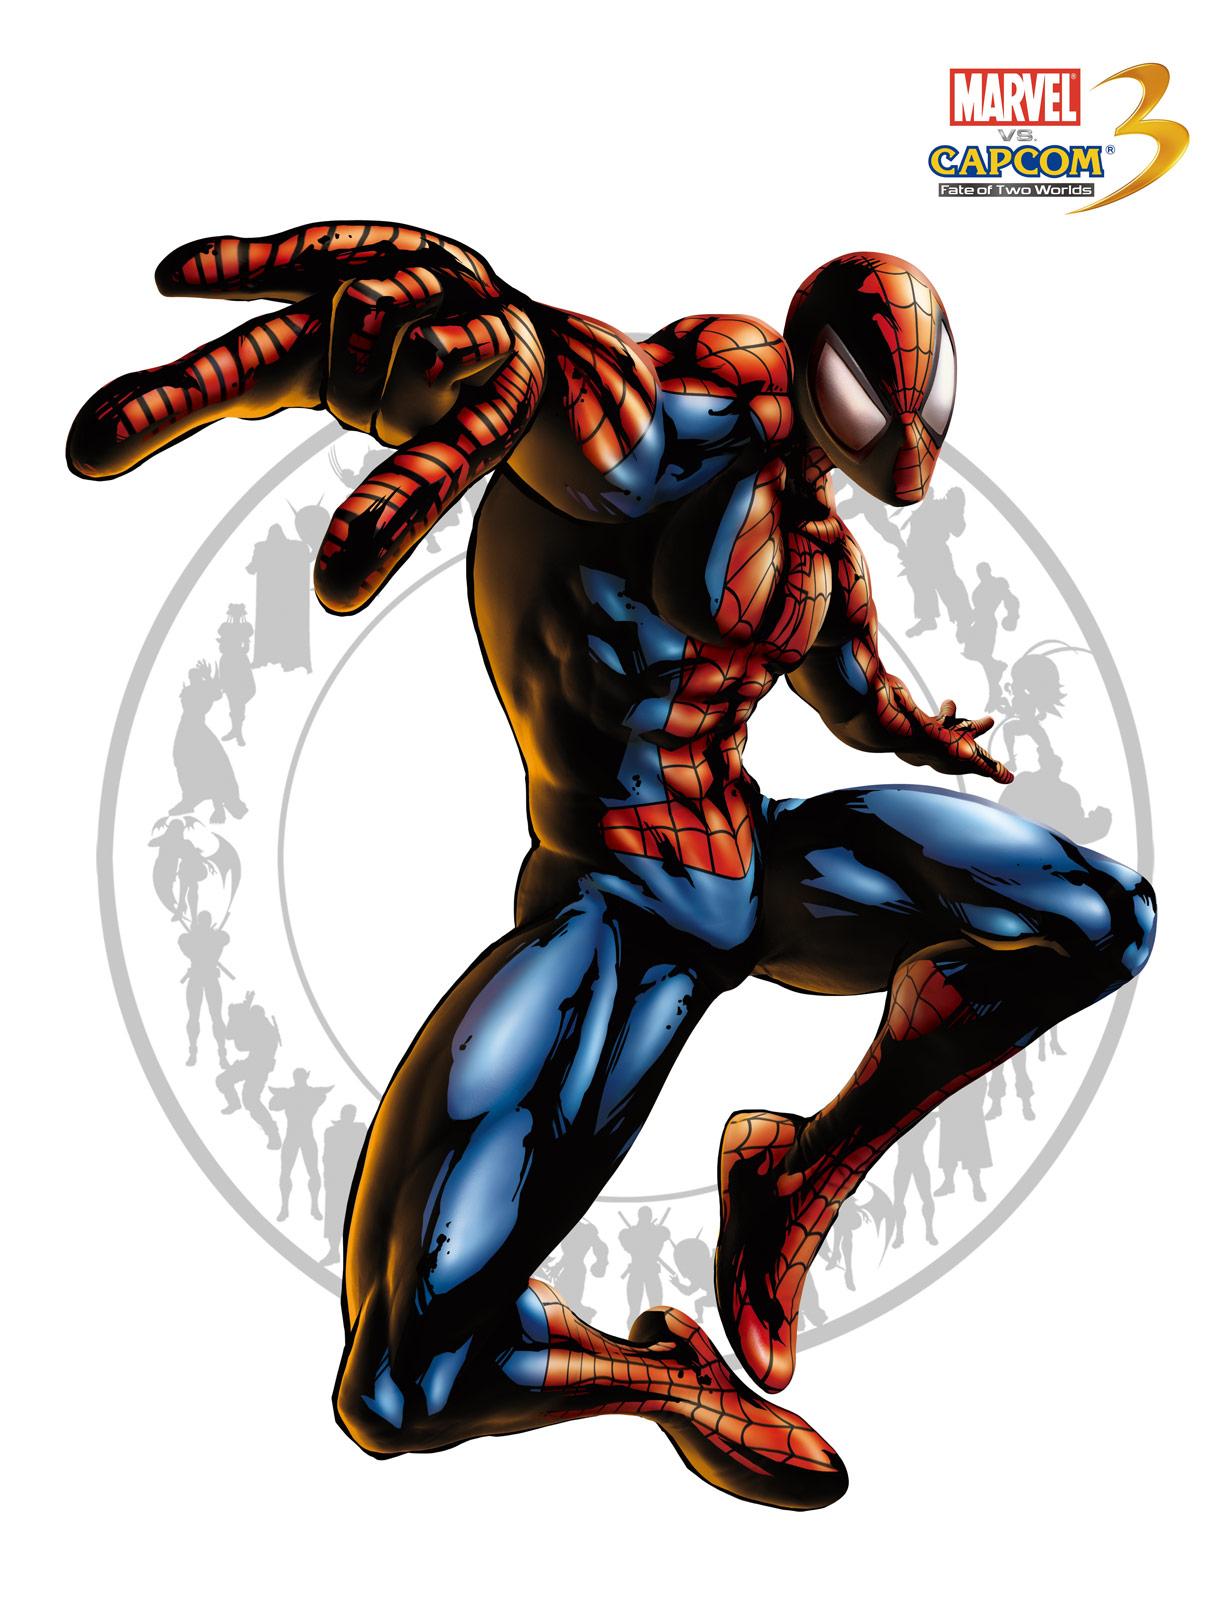 Spider-man artwork for Marvel vs. Capcom 3